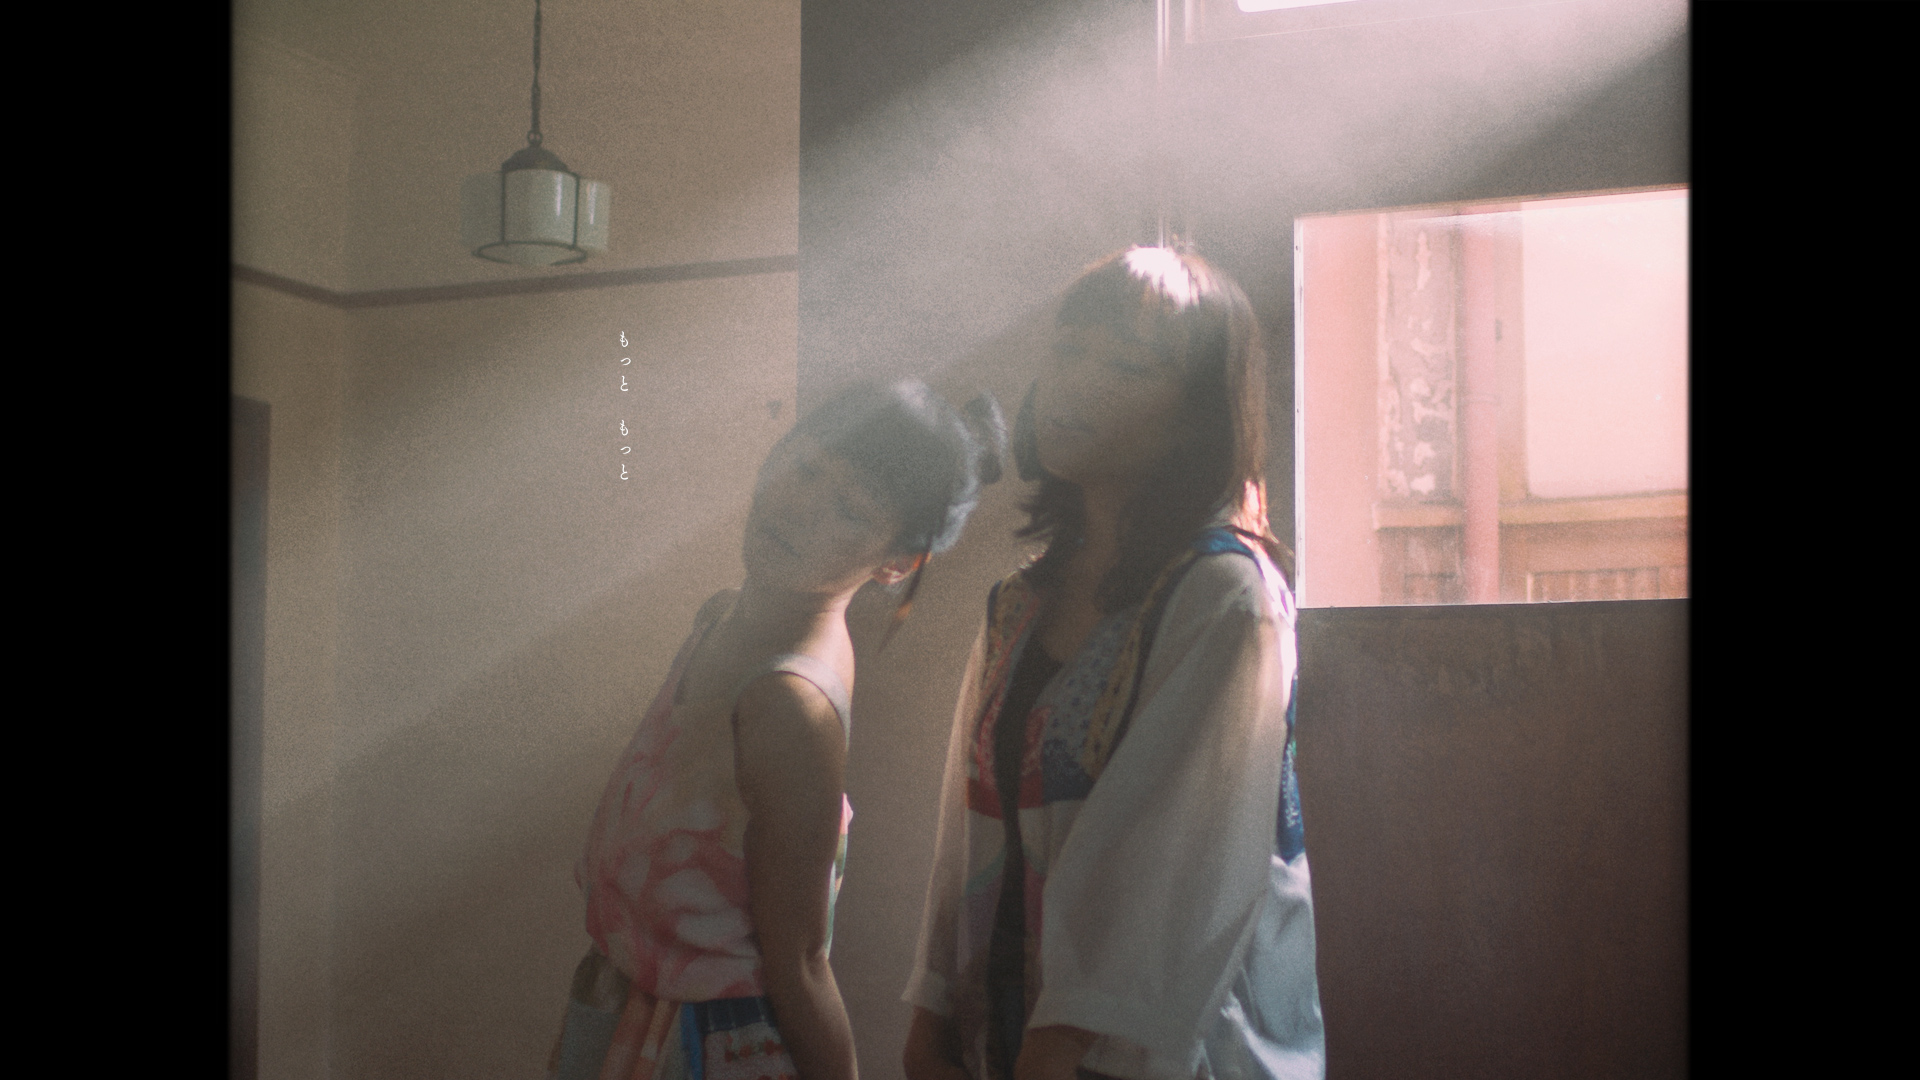 "NABOWA_My Heartbeat (Belong To You)feat. å±±ç""°ãªã¥.mp4.00_02_29_11.Still015.jpg"